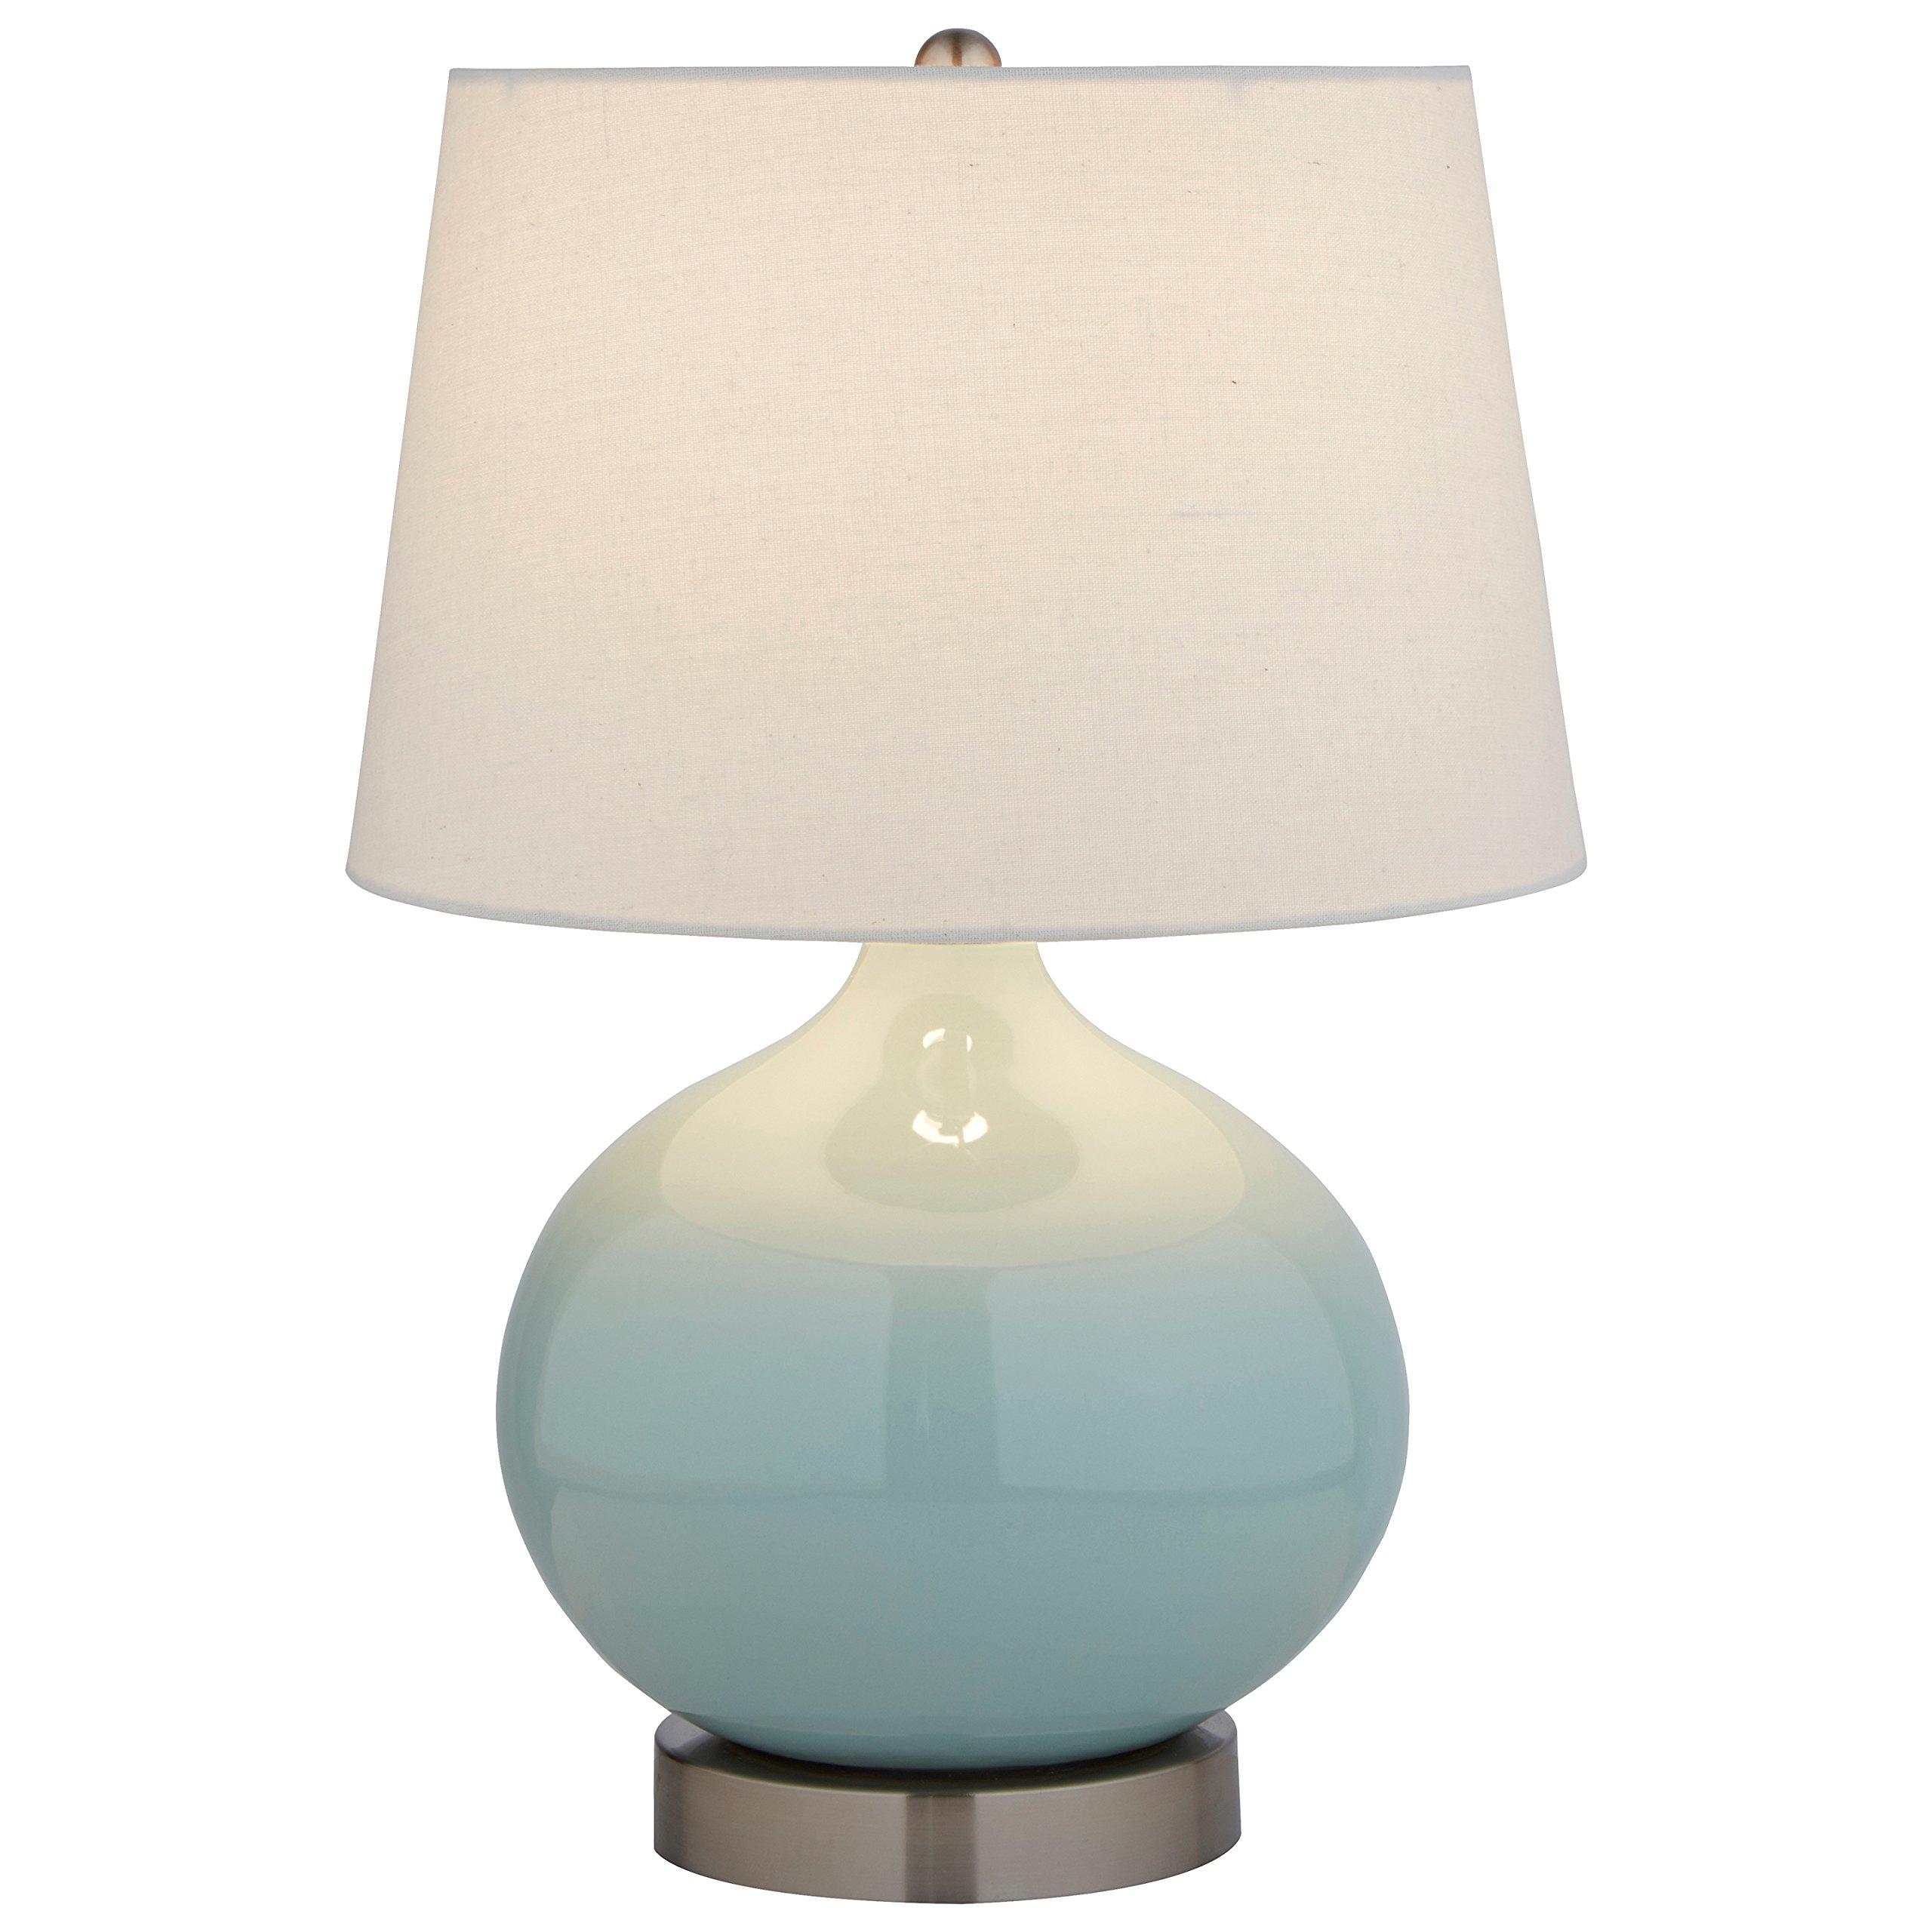 Stone & Beam Cyan Ceramic Lamp, 20''H, with Bulb, White Shade